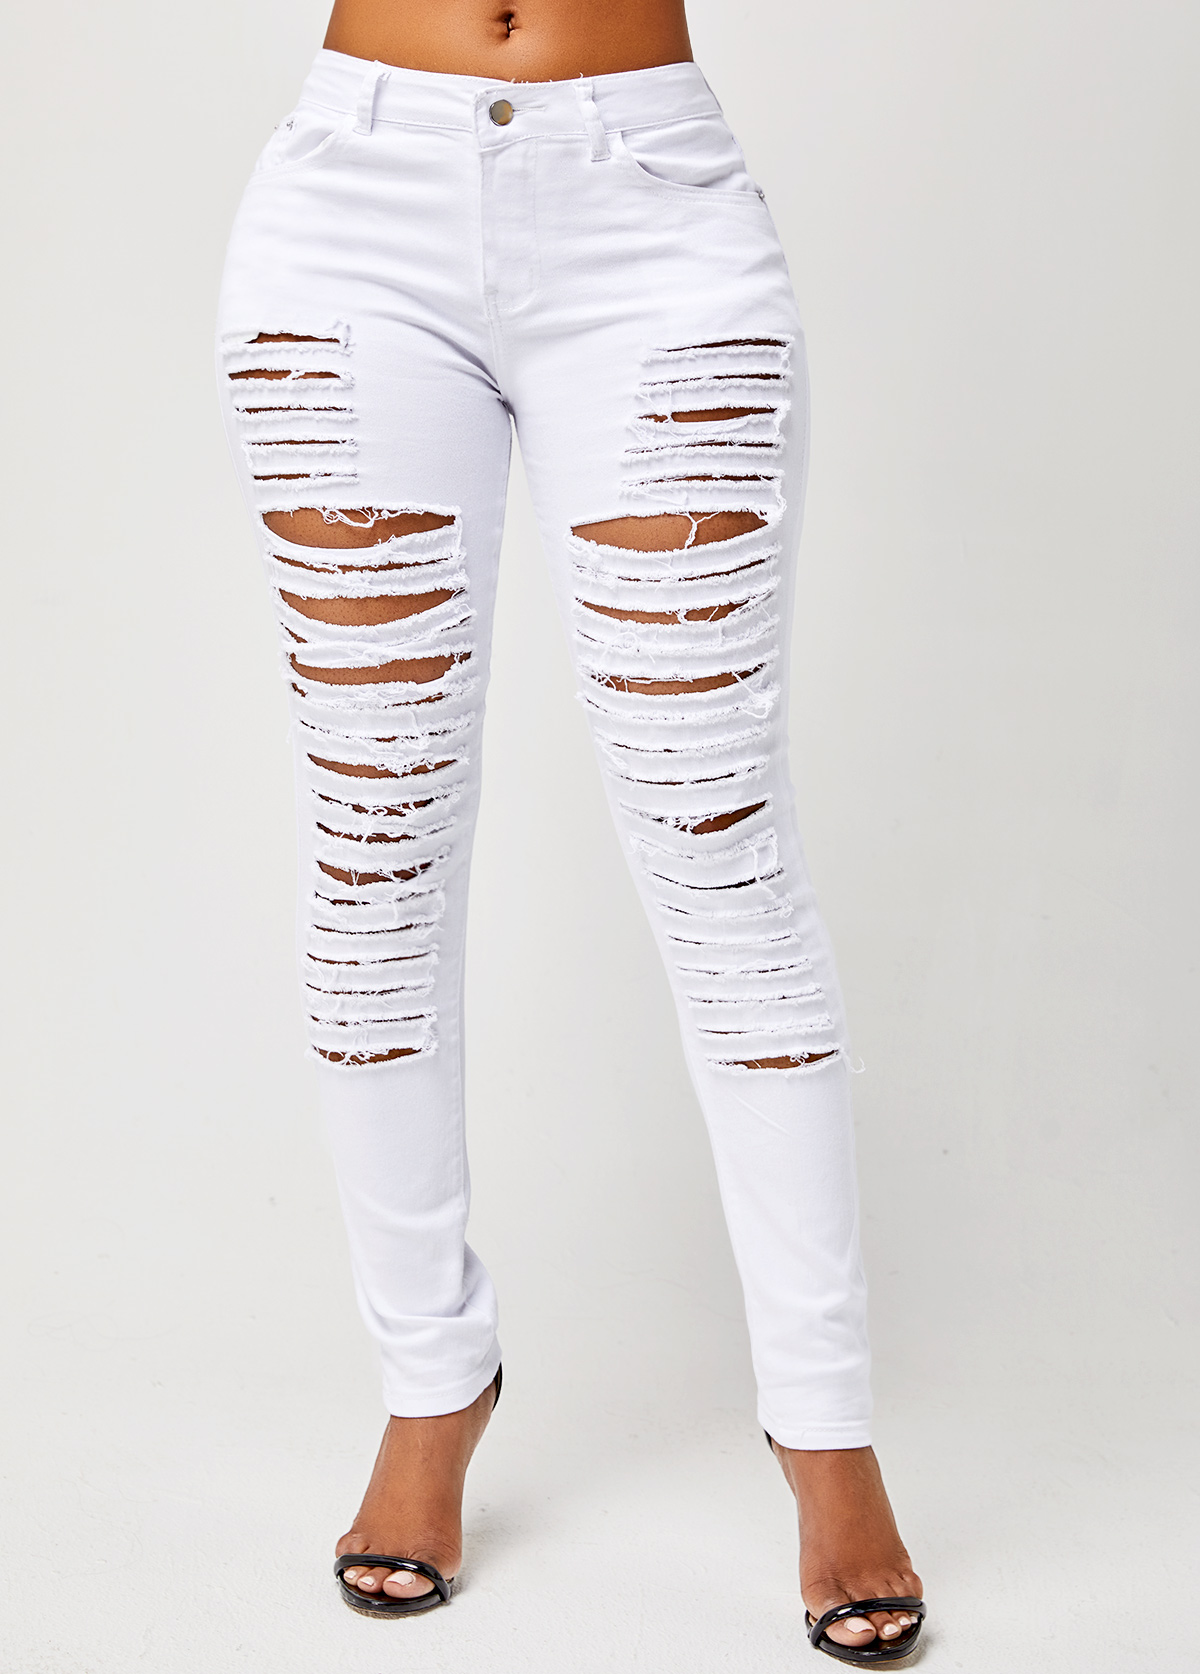 Solid Shredded Skinny Mid Waist Jeans